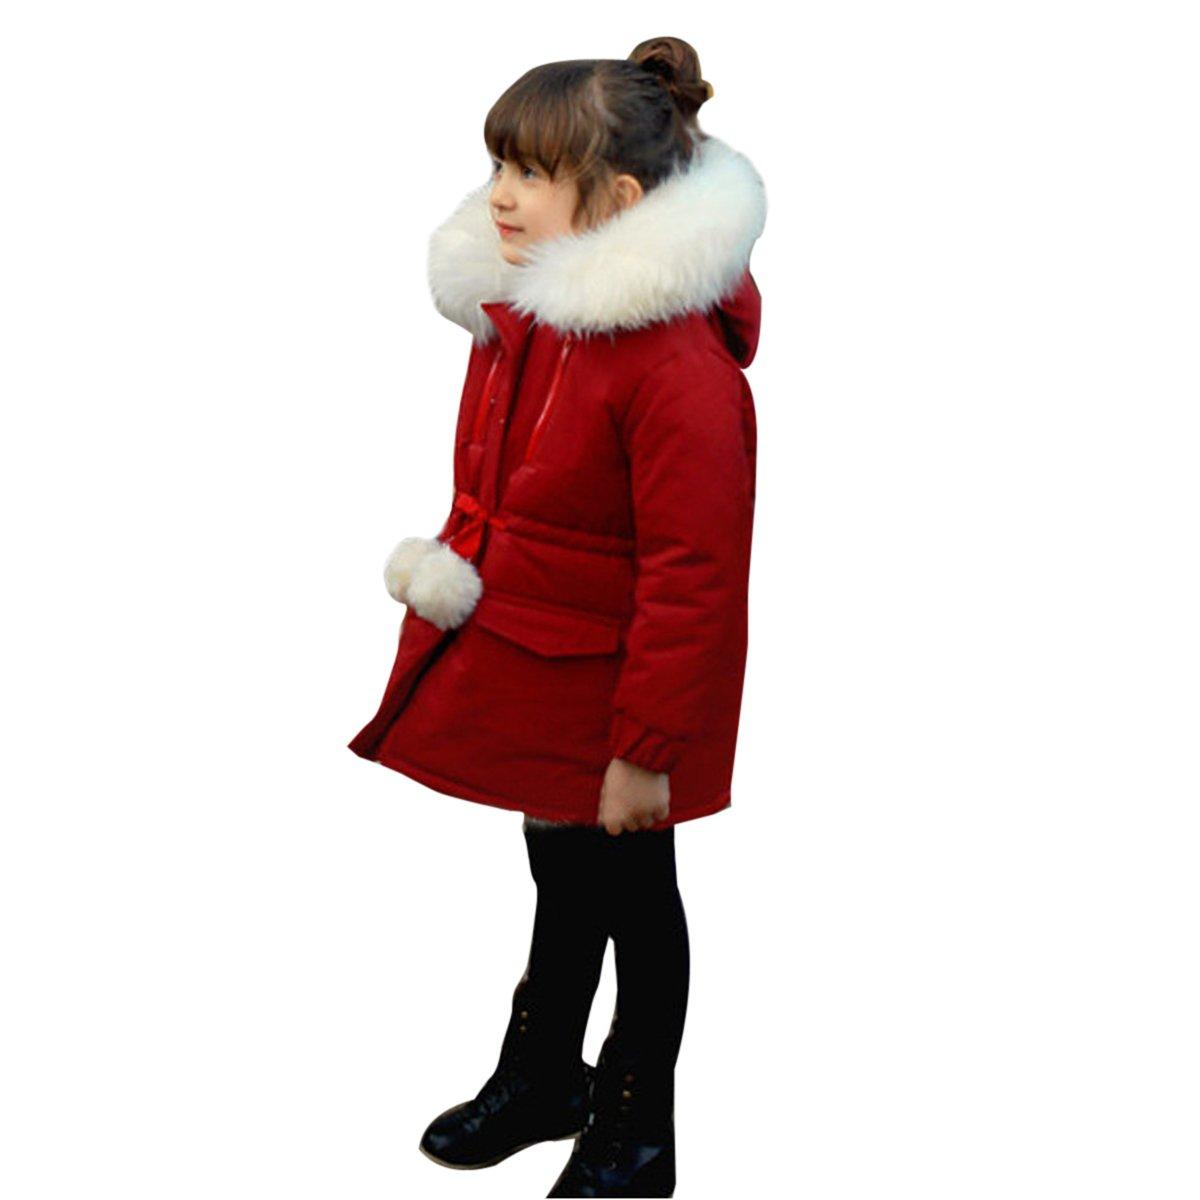 466cb20224425 Bebone Enfant Filles Hiver Duvet Manteau avec Capuche de fourrure avec  Capuche de fourrure